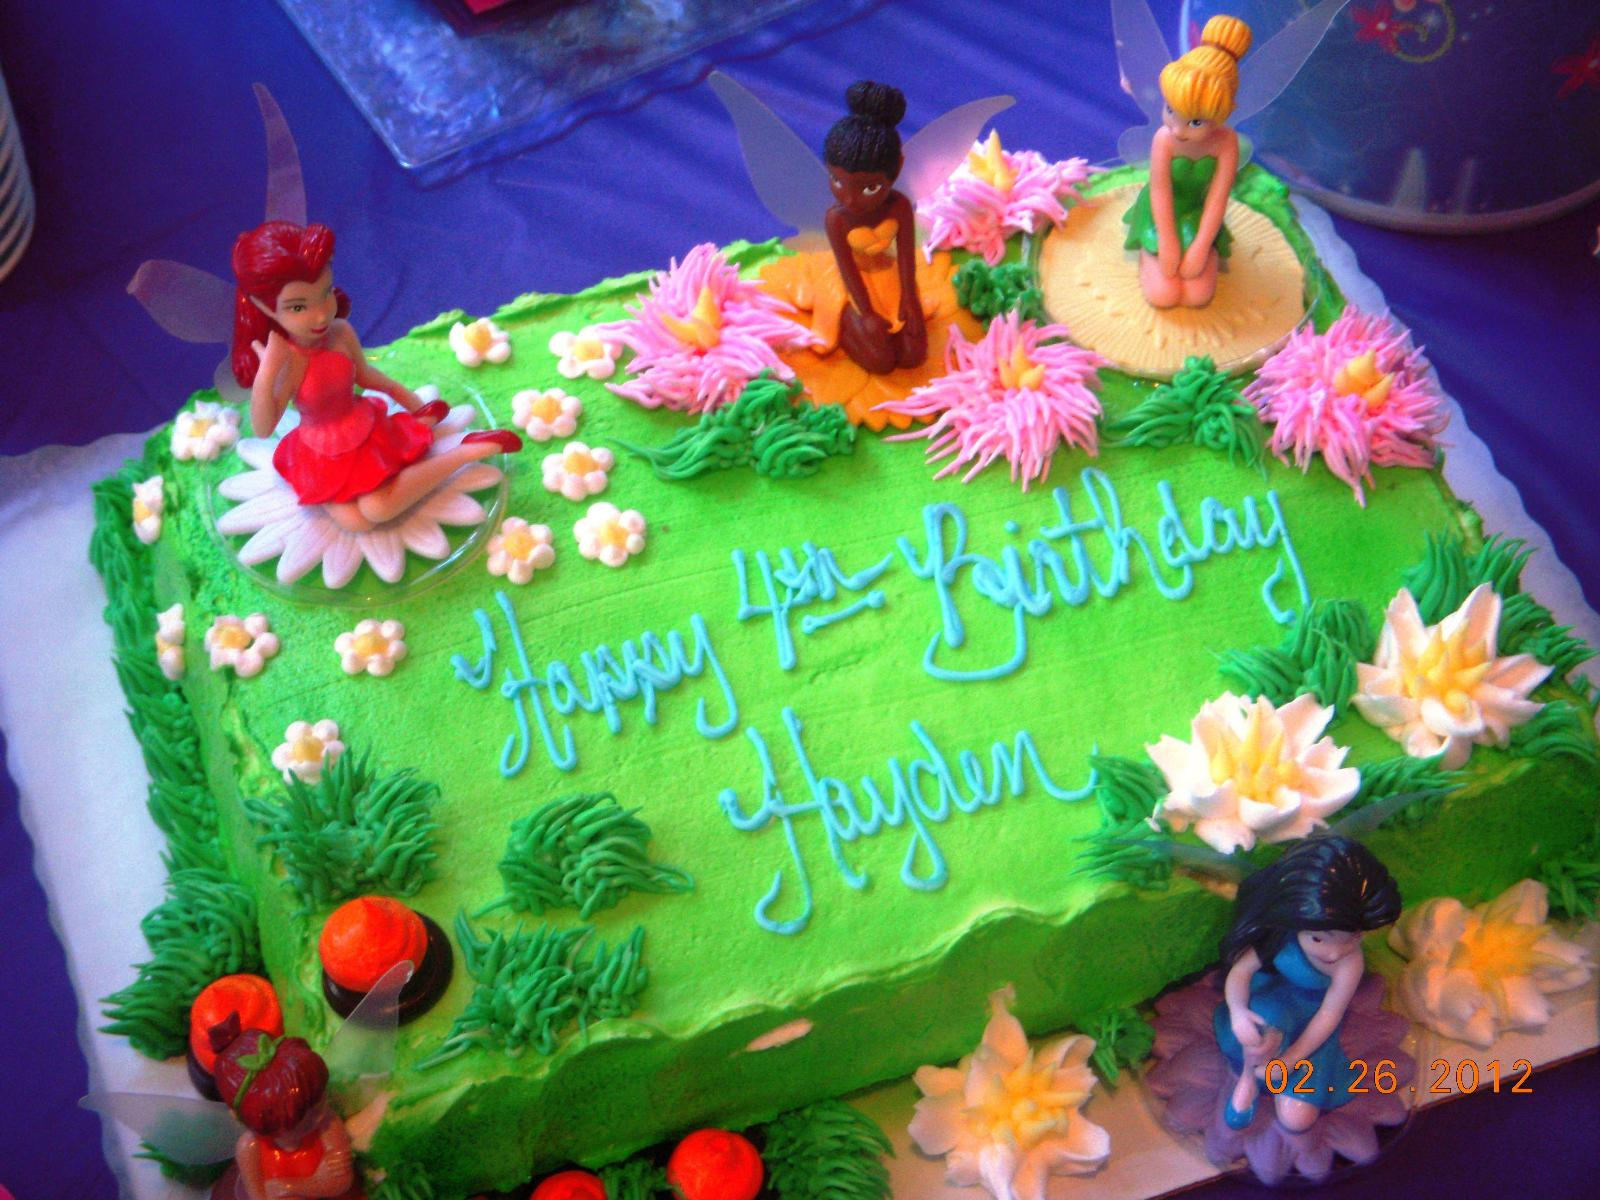 Sensational 10 Safeway Birthday Cakes Animal Photo Kids Birthday Cakes At Personalised Birthday Cards Paralily Jamesorg